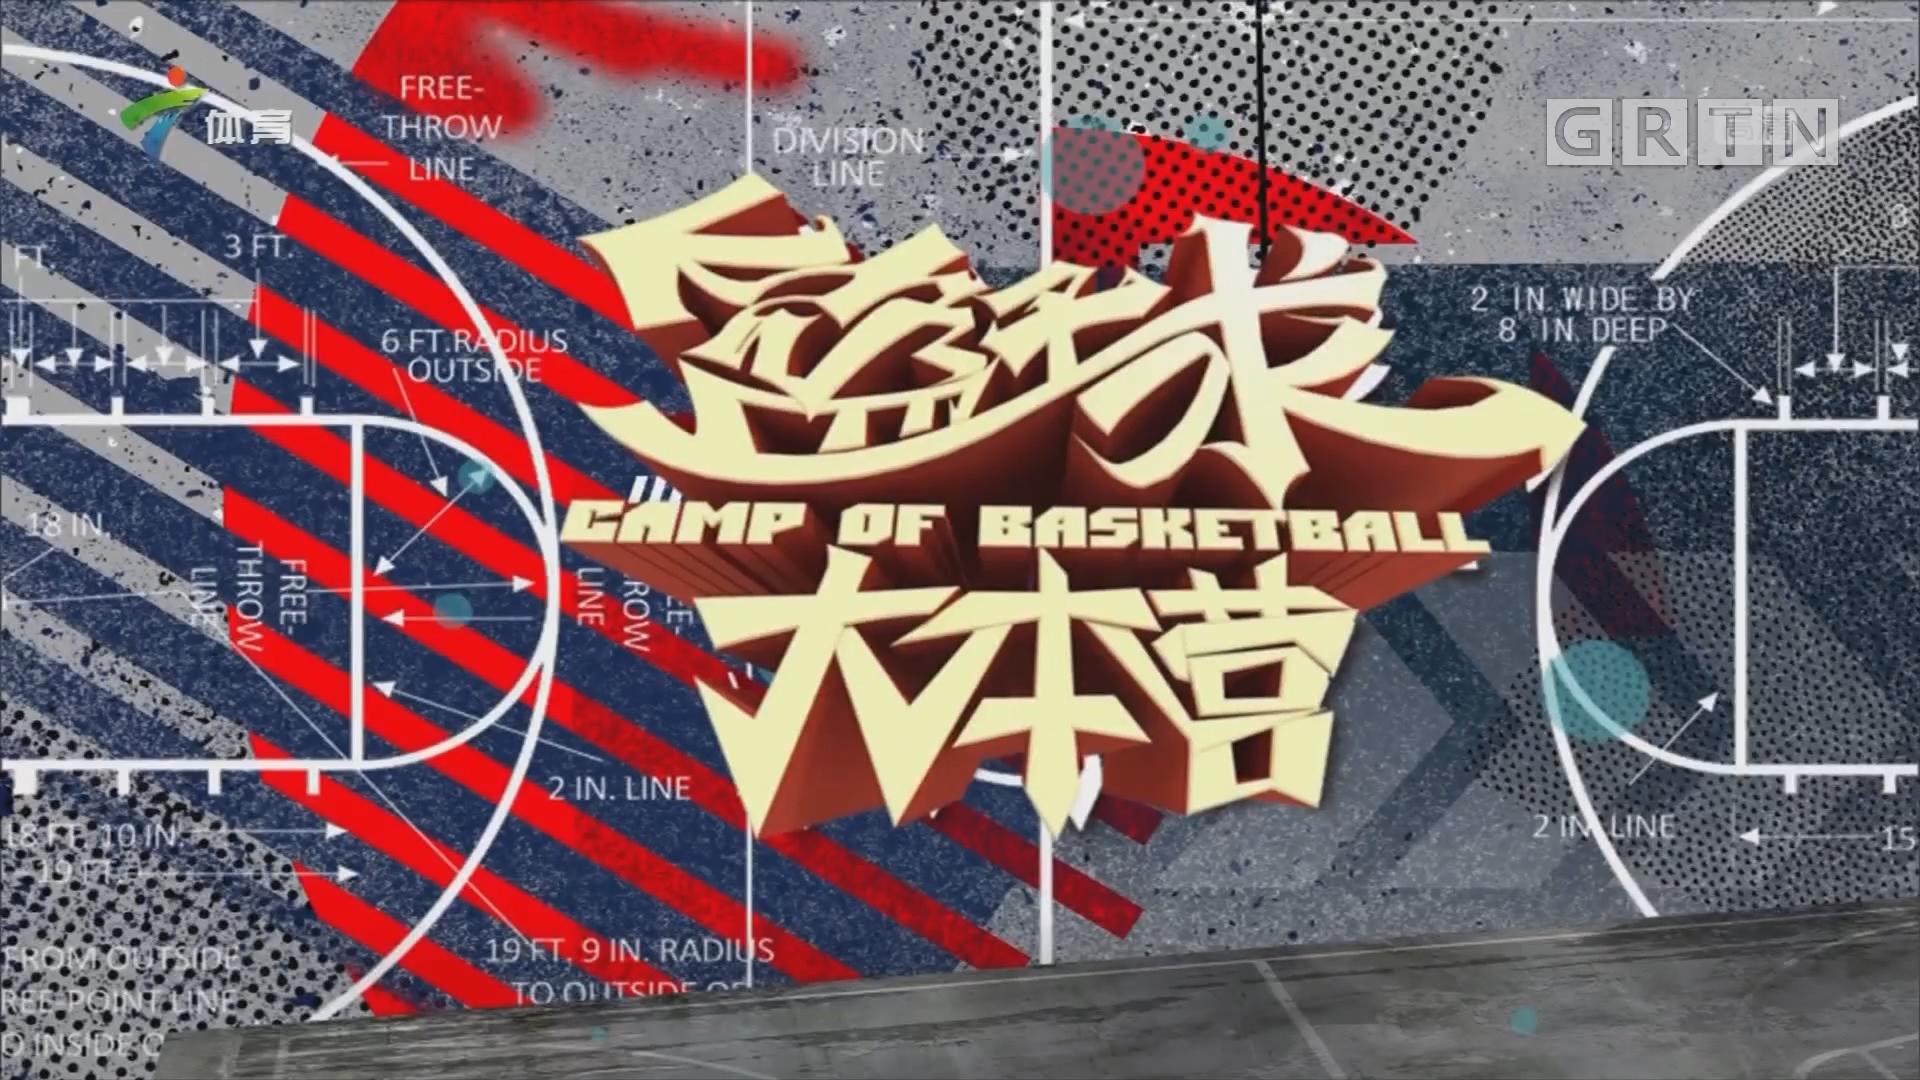 [HD][2019-05-02]篮球大本营:疆粤大战 广东主场两战全胜占先机